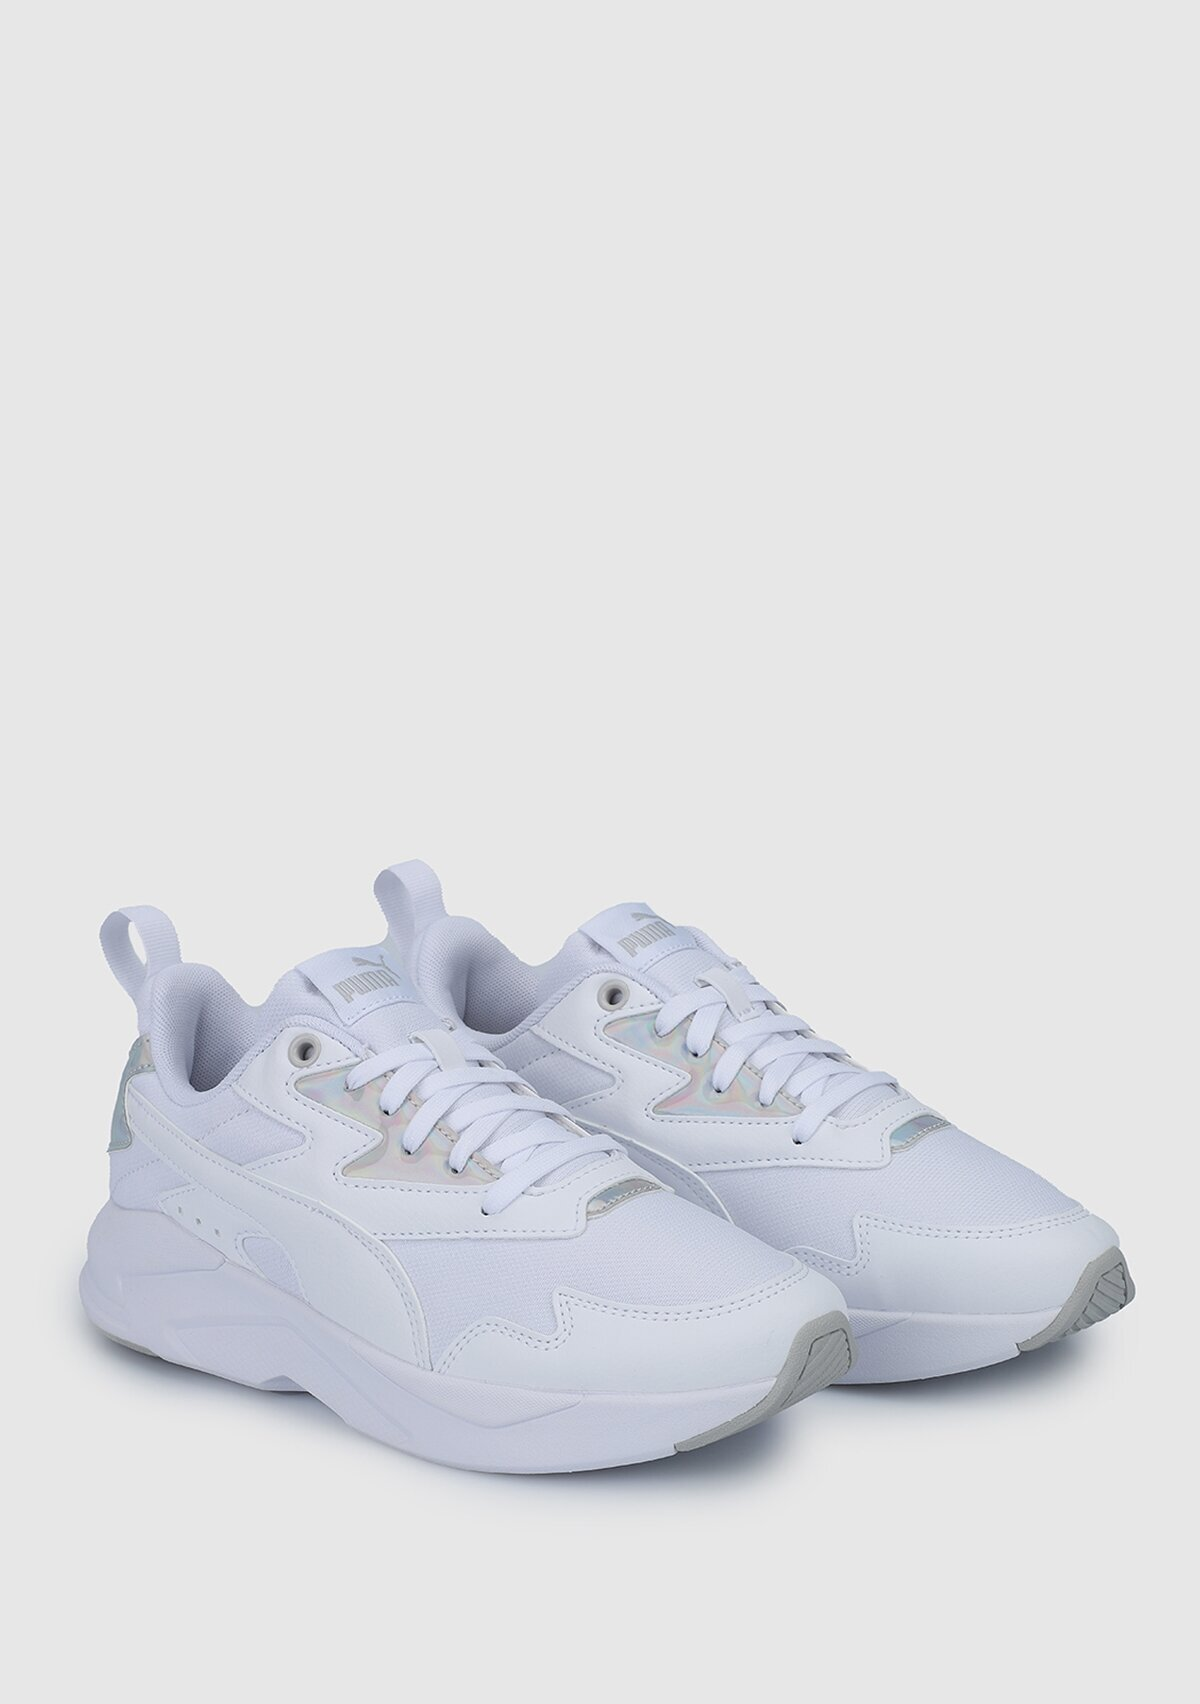 resm X-Ray Lite Metallic Wmn S Puma White-Pum Beyaz Kadın Sneaker 36885803